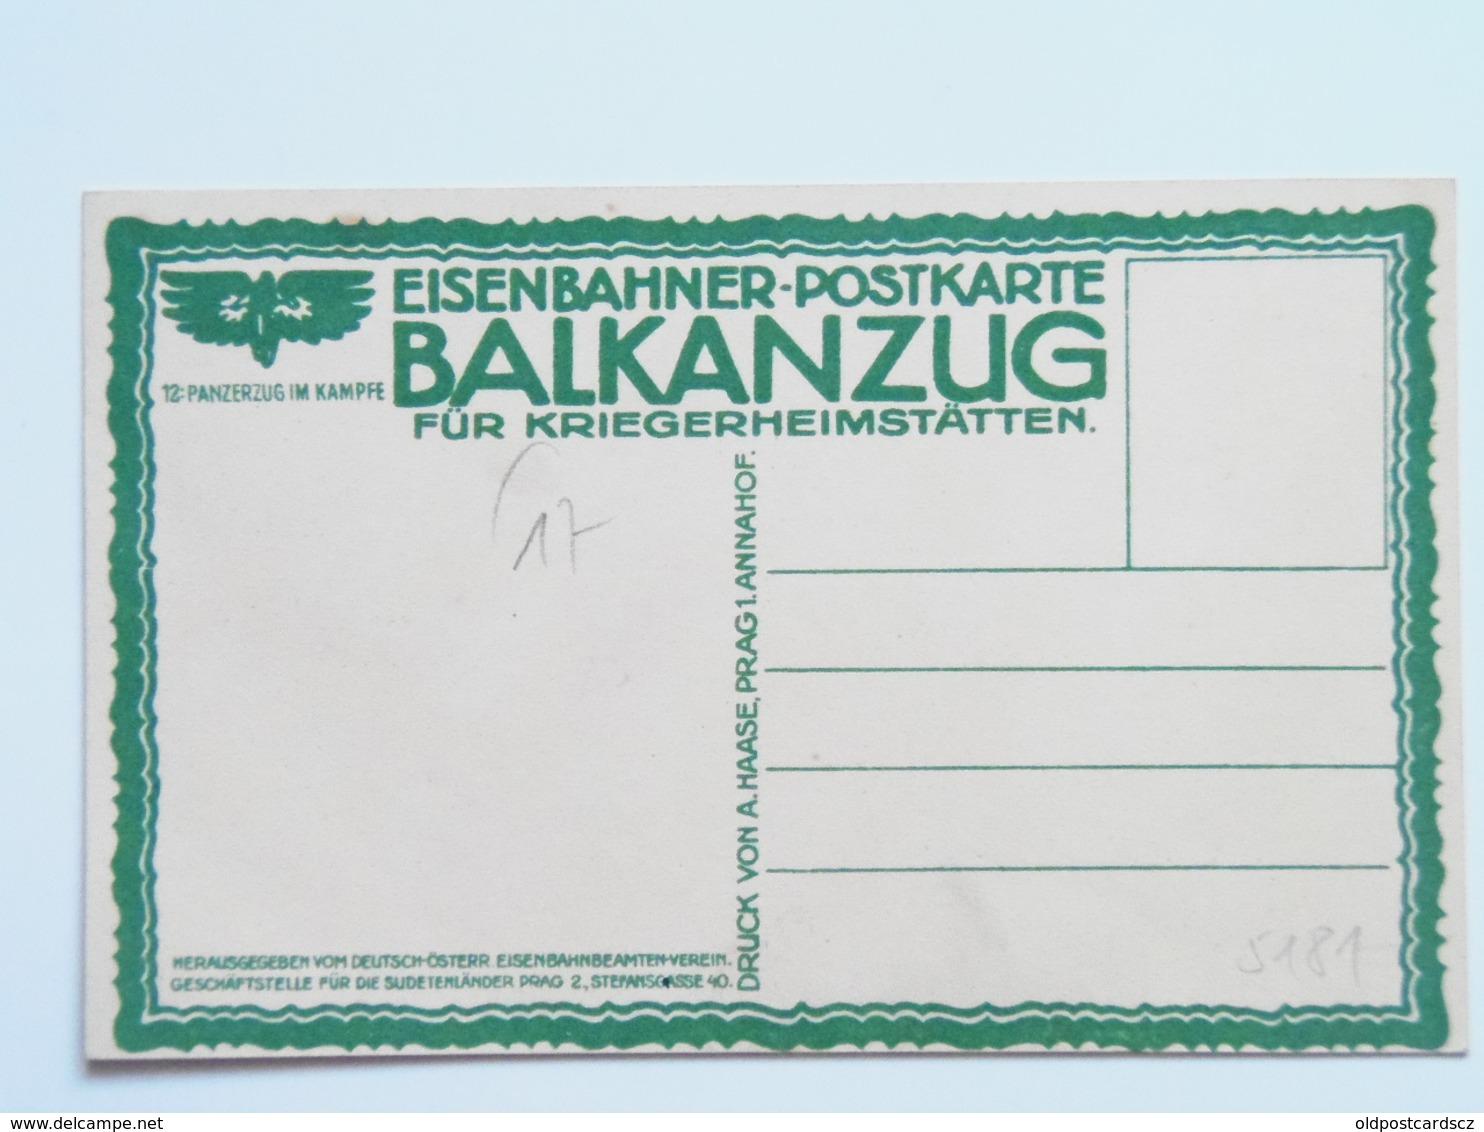 5181 Prima Guerra Pubblicitaria Militare 1916 Balkanzug Litho Treno Ed Hasse Prag Ferrovia Eisenbahn No 12 Panzerzug - Guerra 1914-18